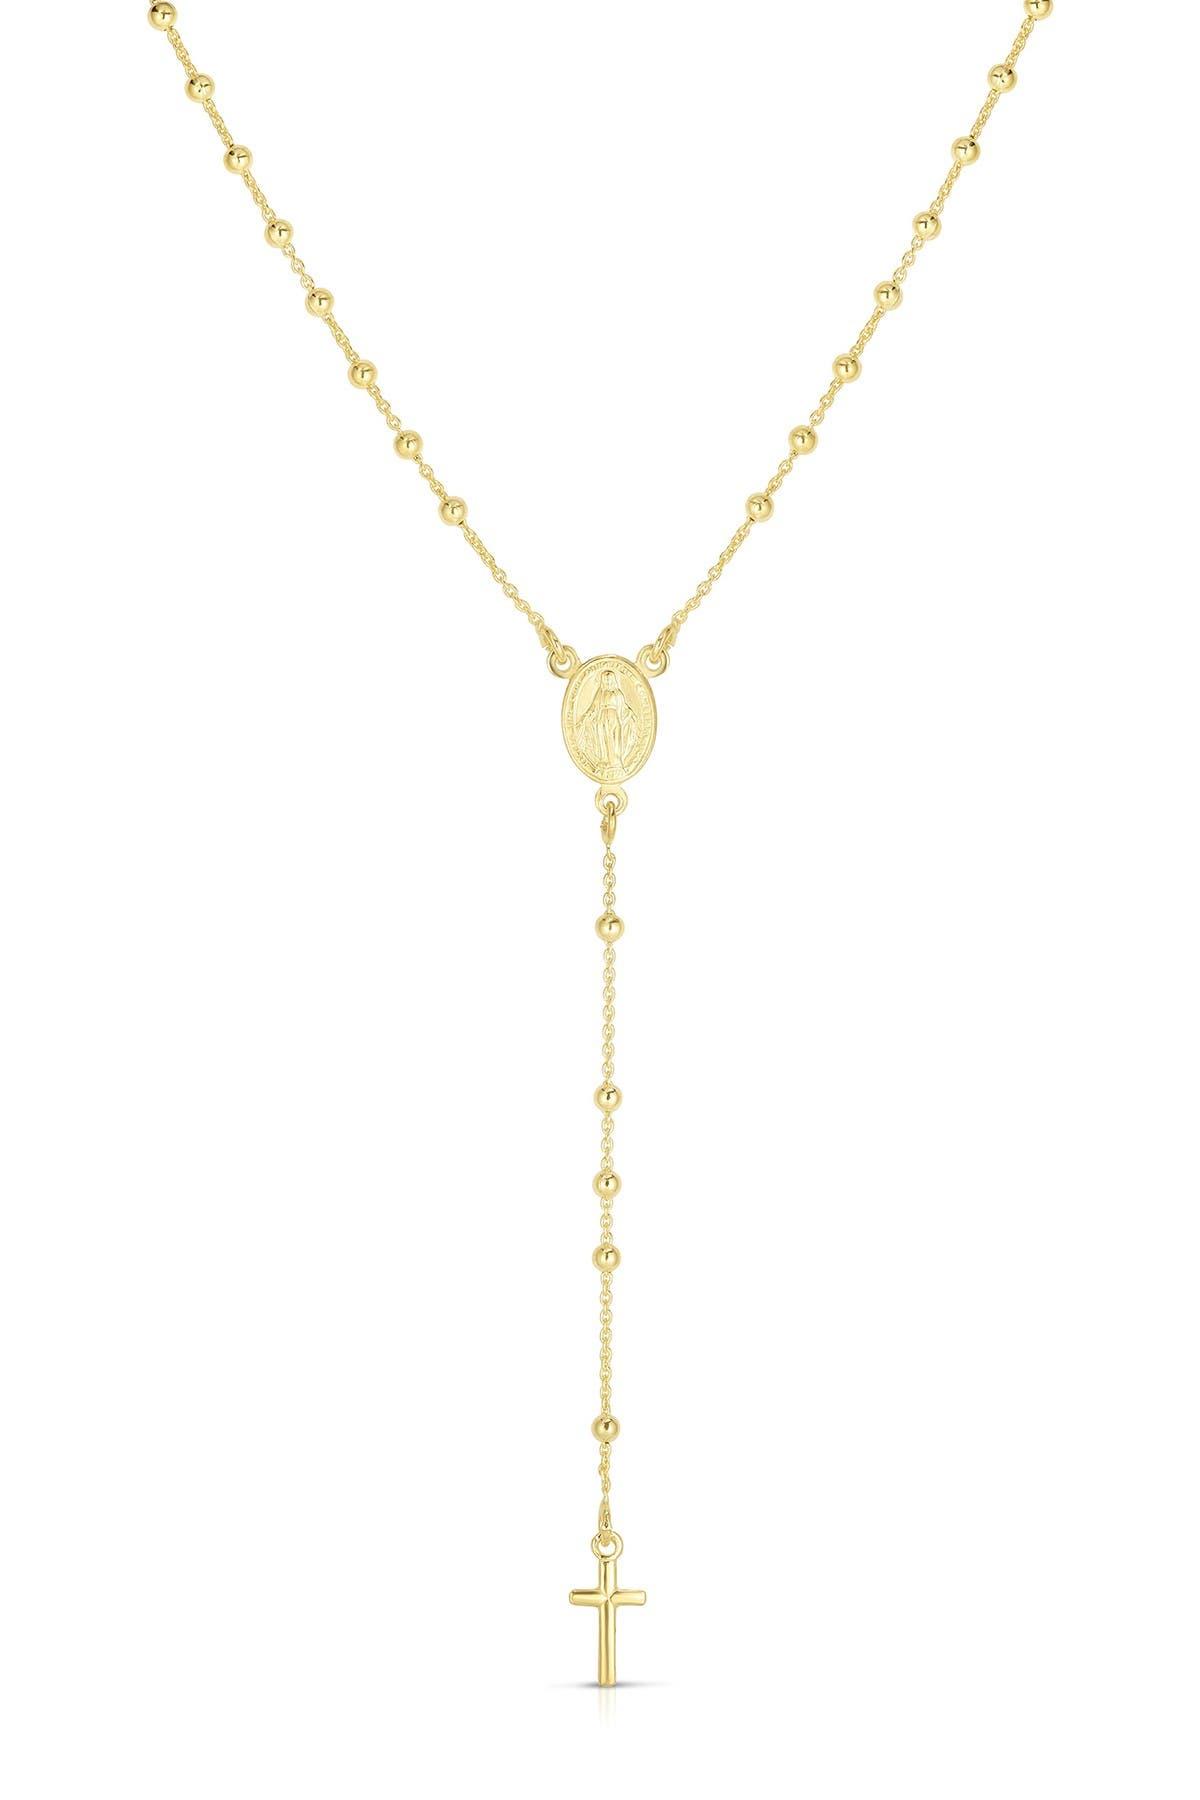 Sterling silver tie necklace star pendant Y necklace